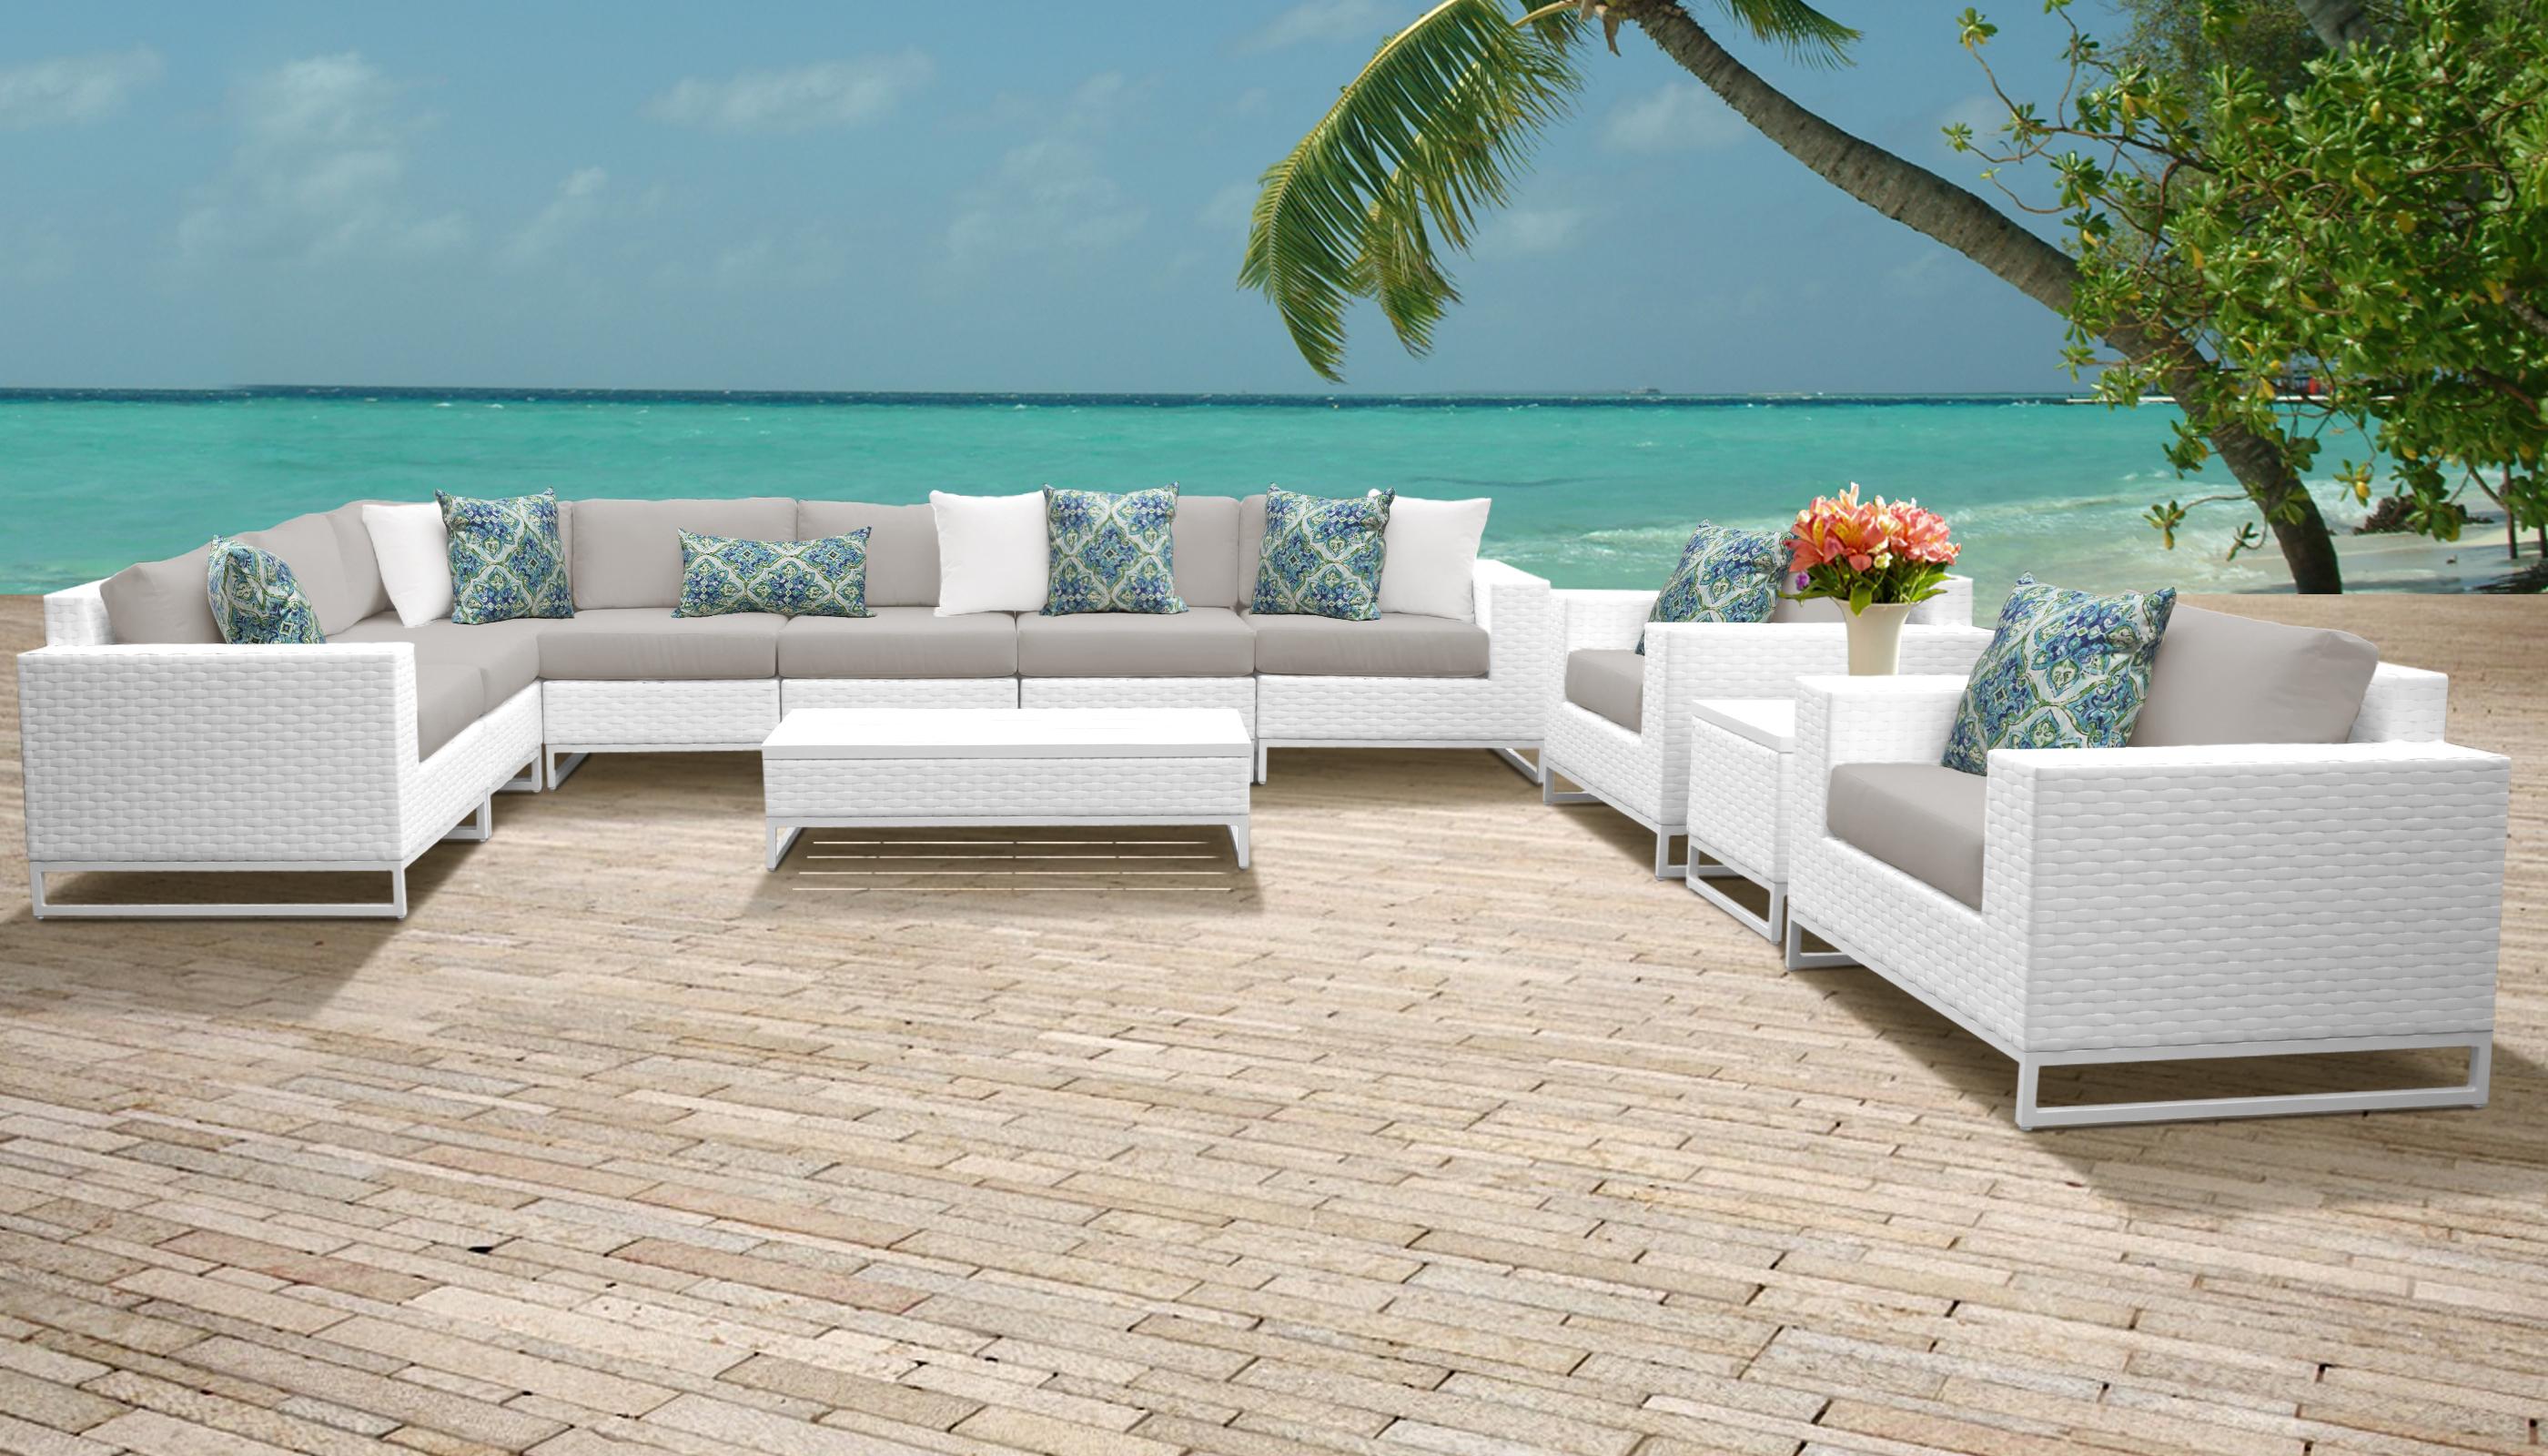 Miami 11 Piece Outdoor Wicker Patio Furniture Set 11a